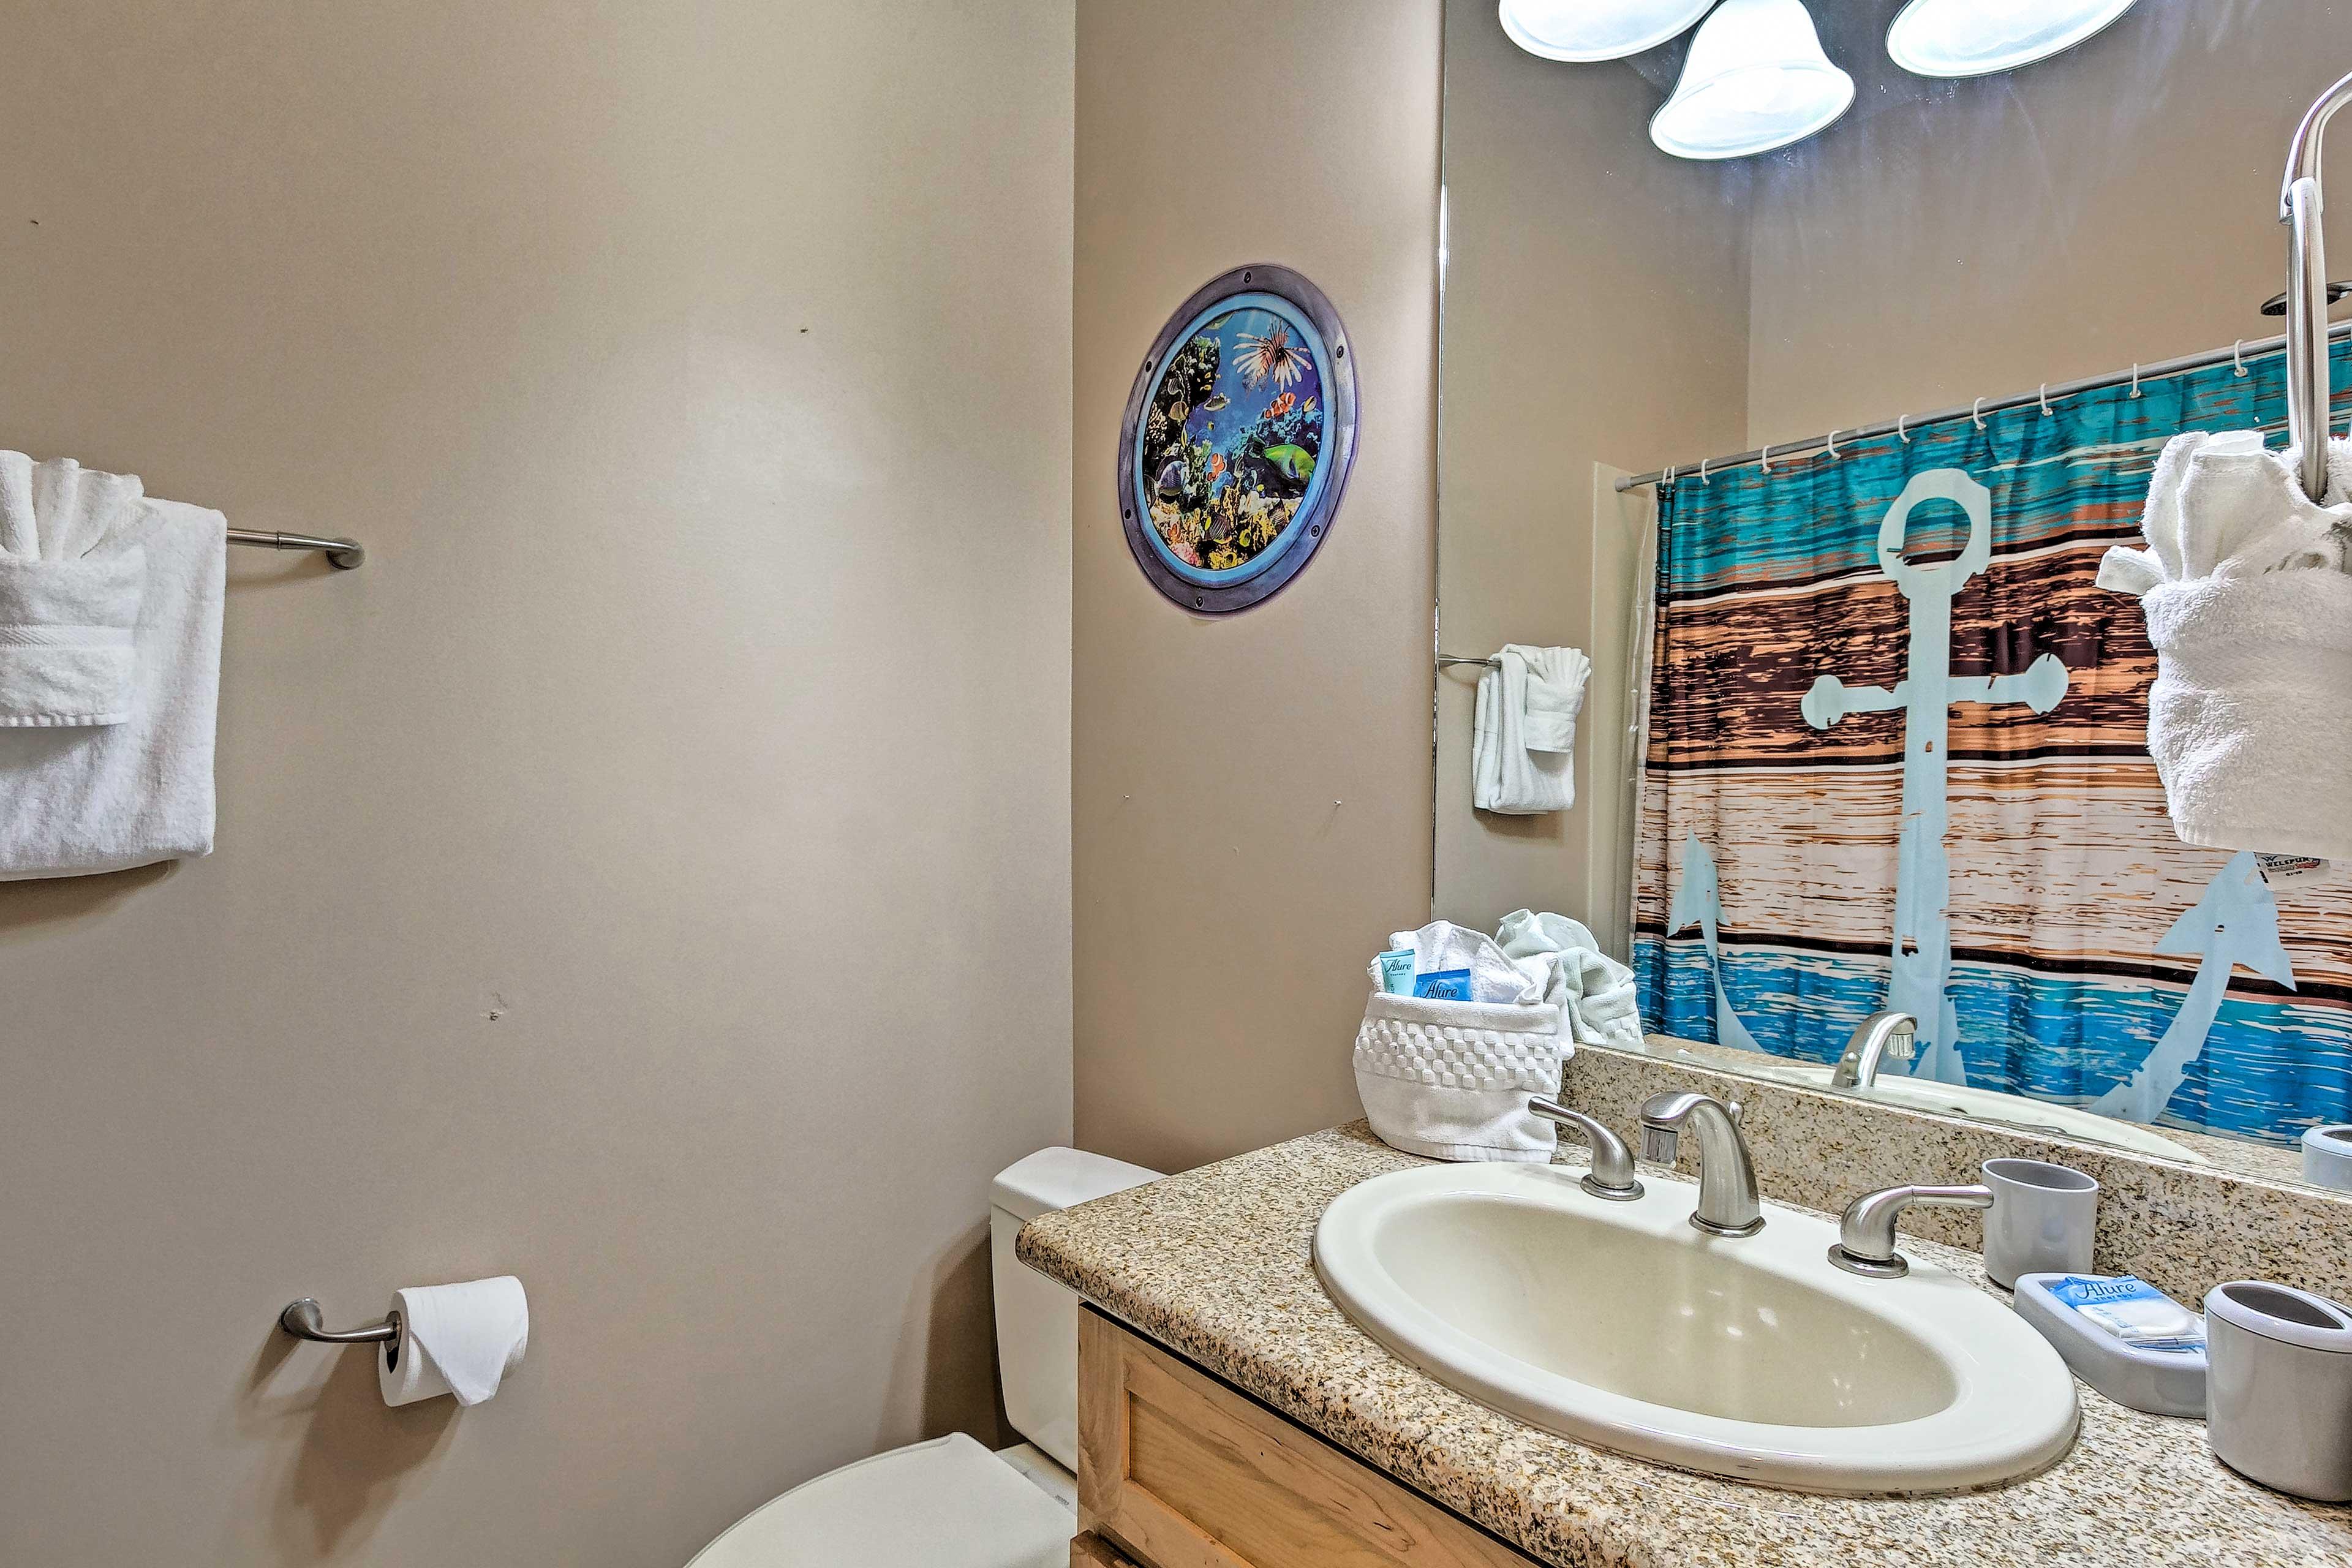 Freshen up in this private en-suite bathroom.